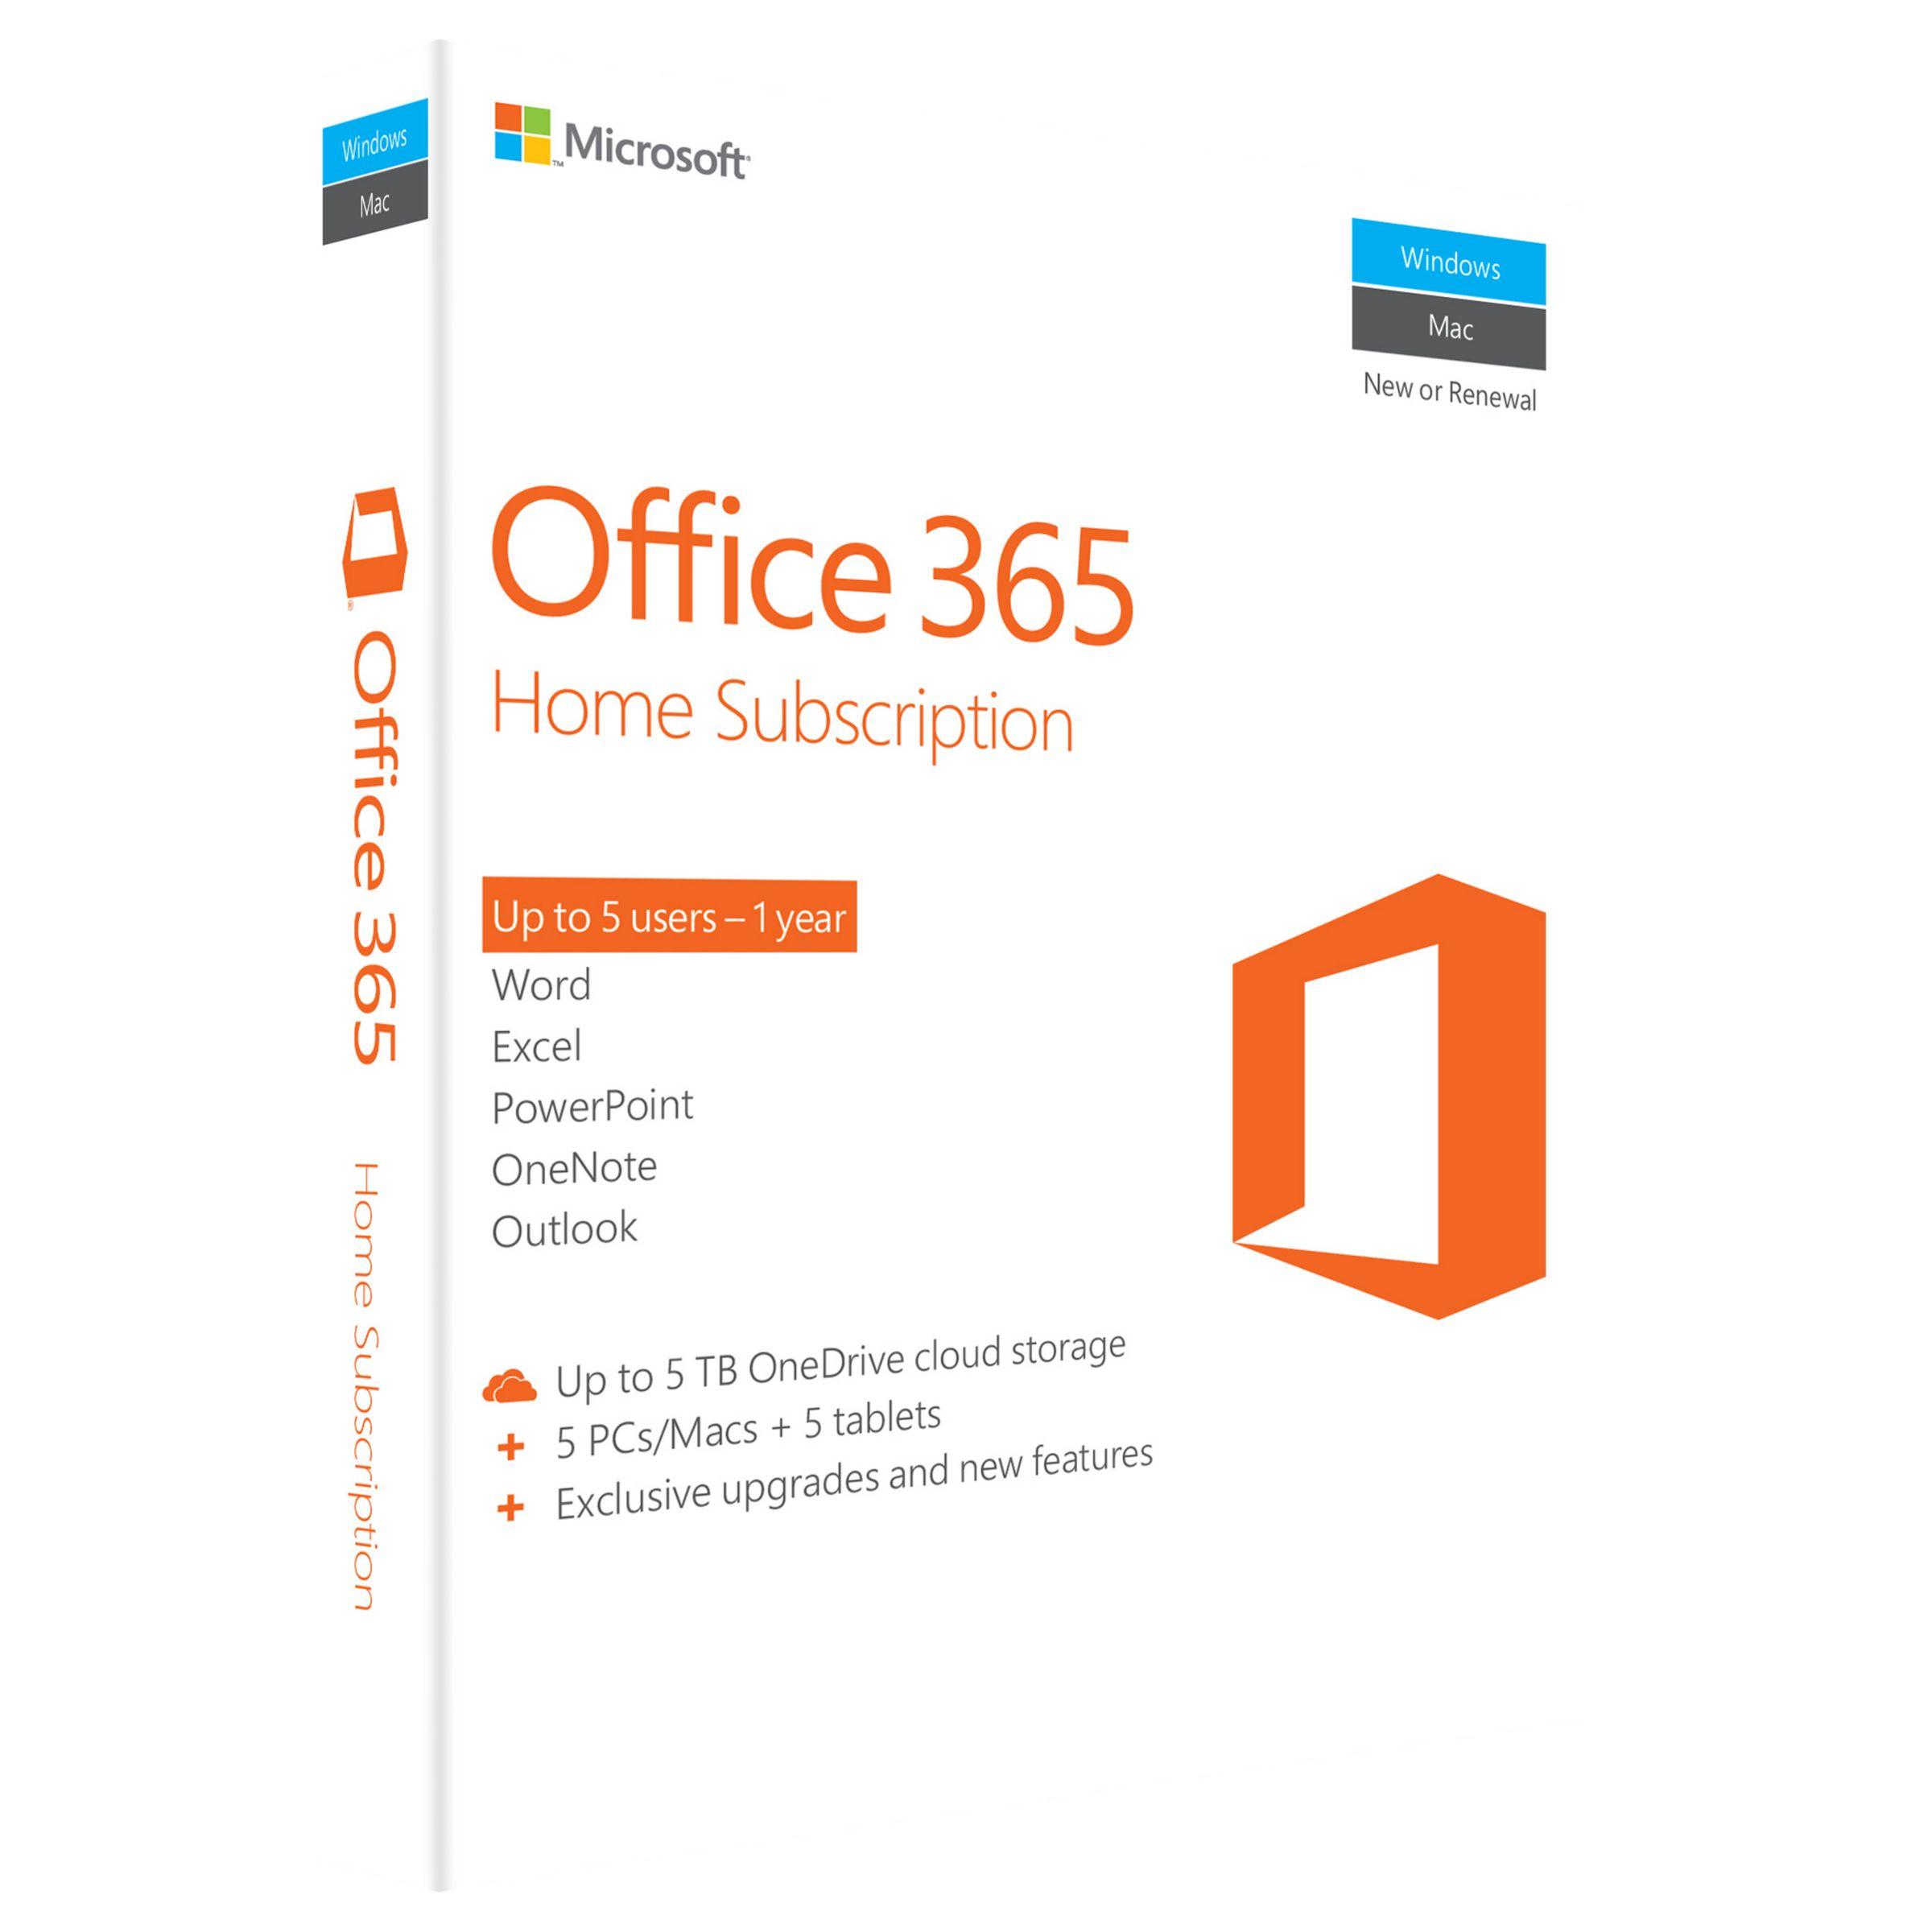 Microsoft Microsoft Office 365 Home Premium, 5 PCs/Macs + Tablet, One-Year Subscription